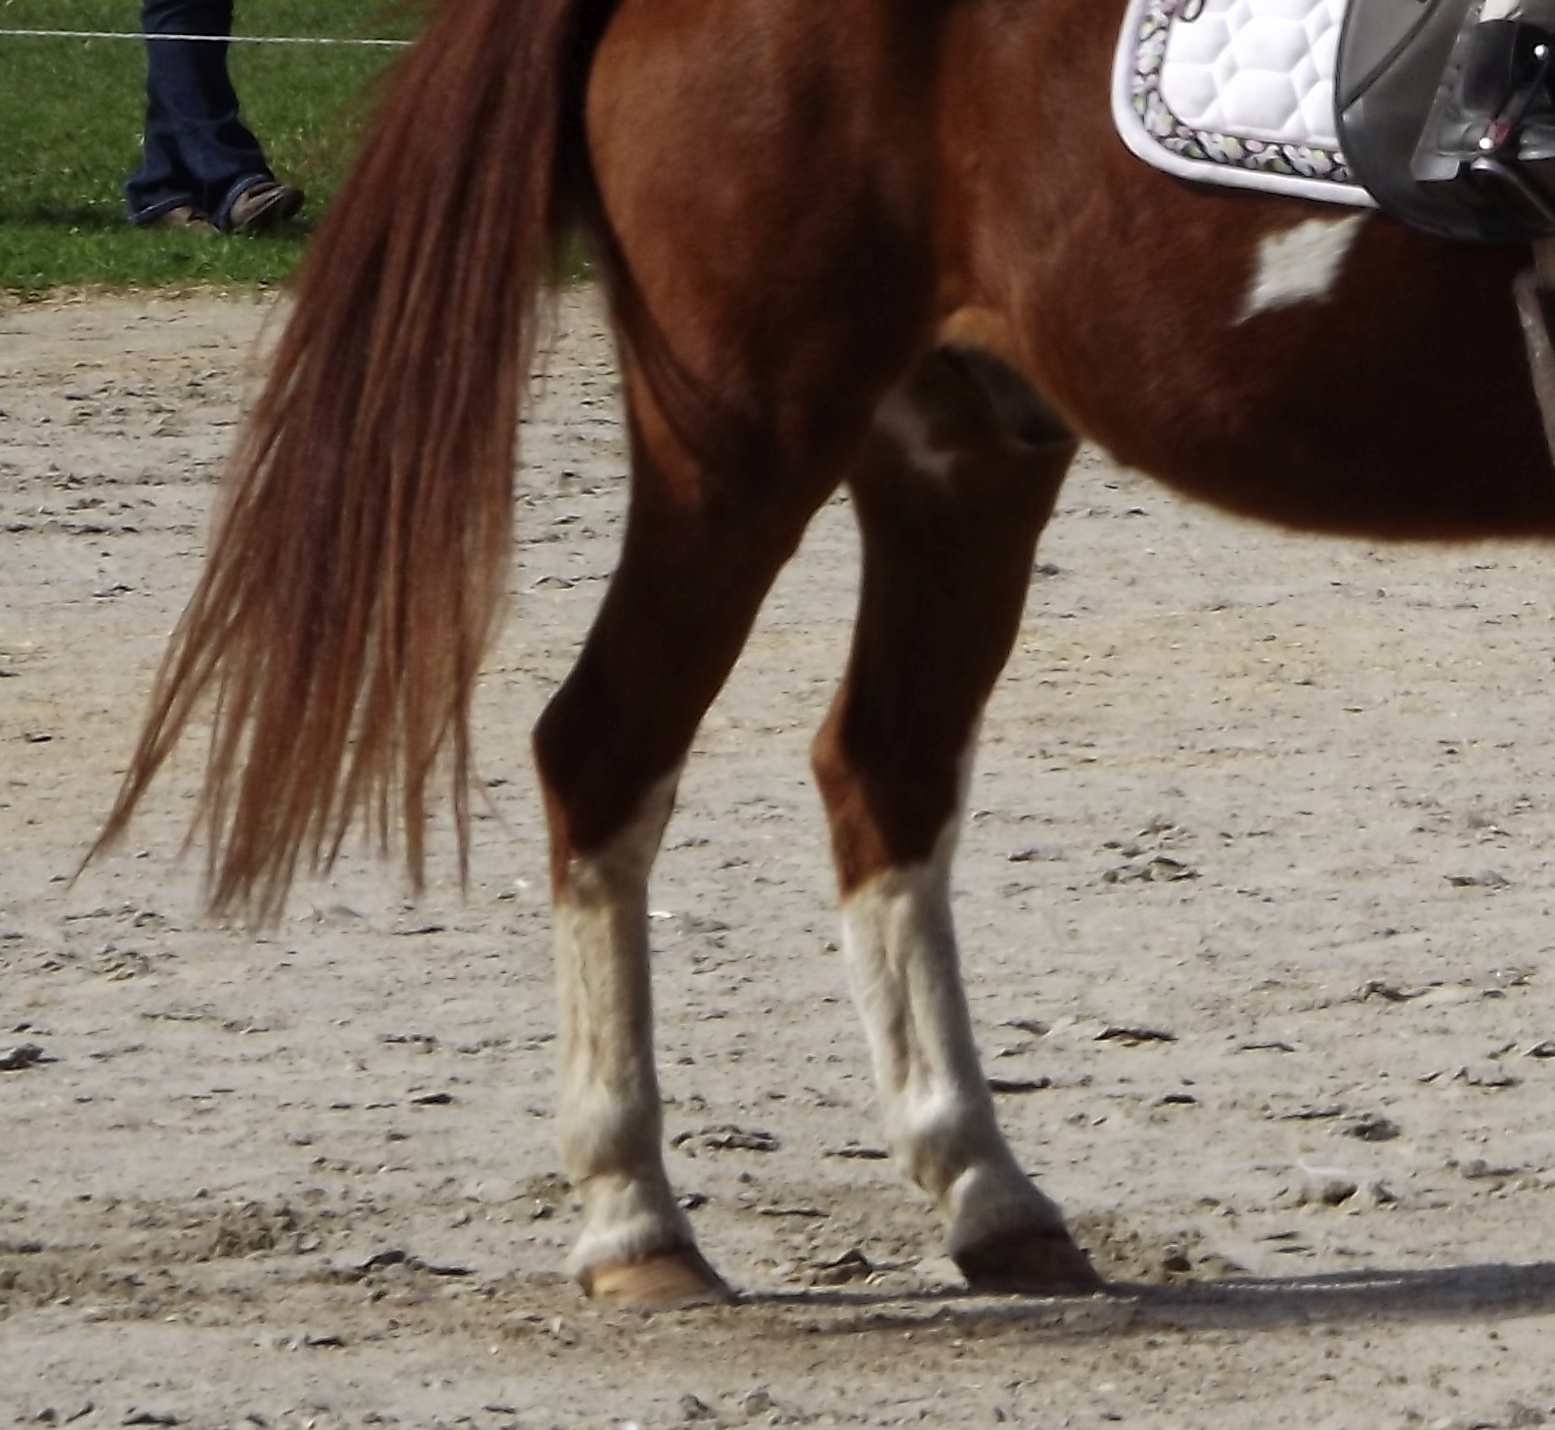 Horse back legs